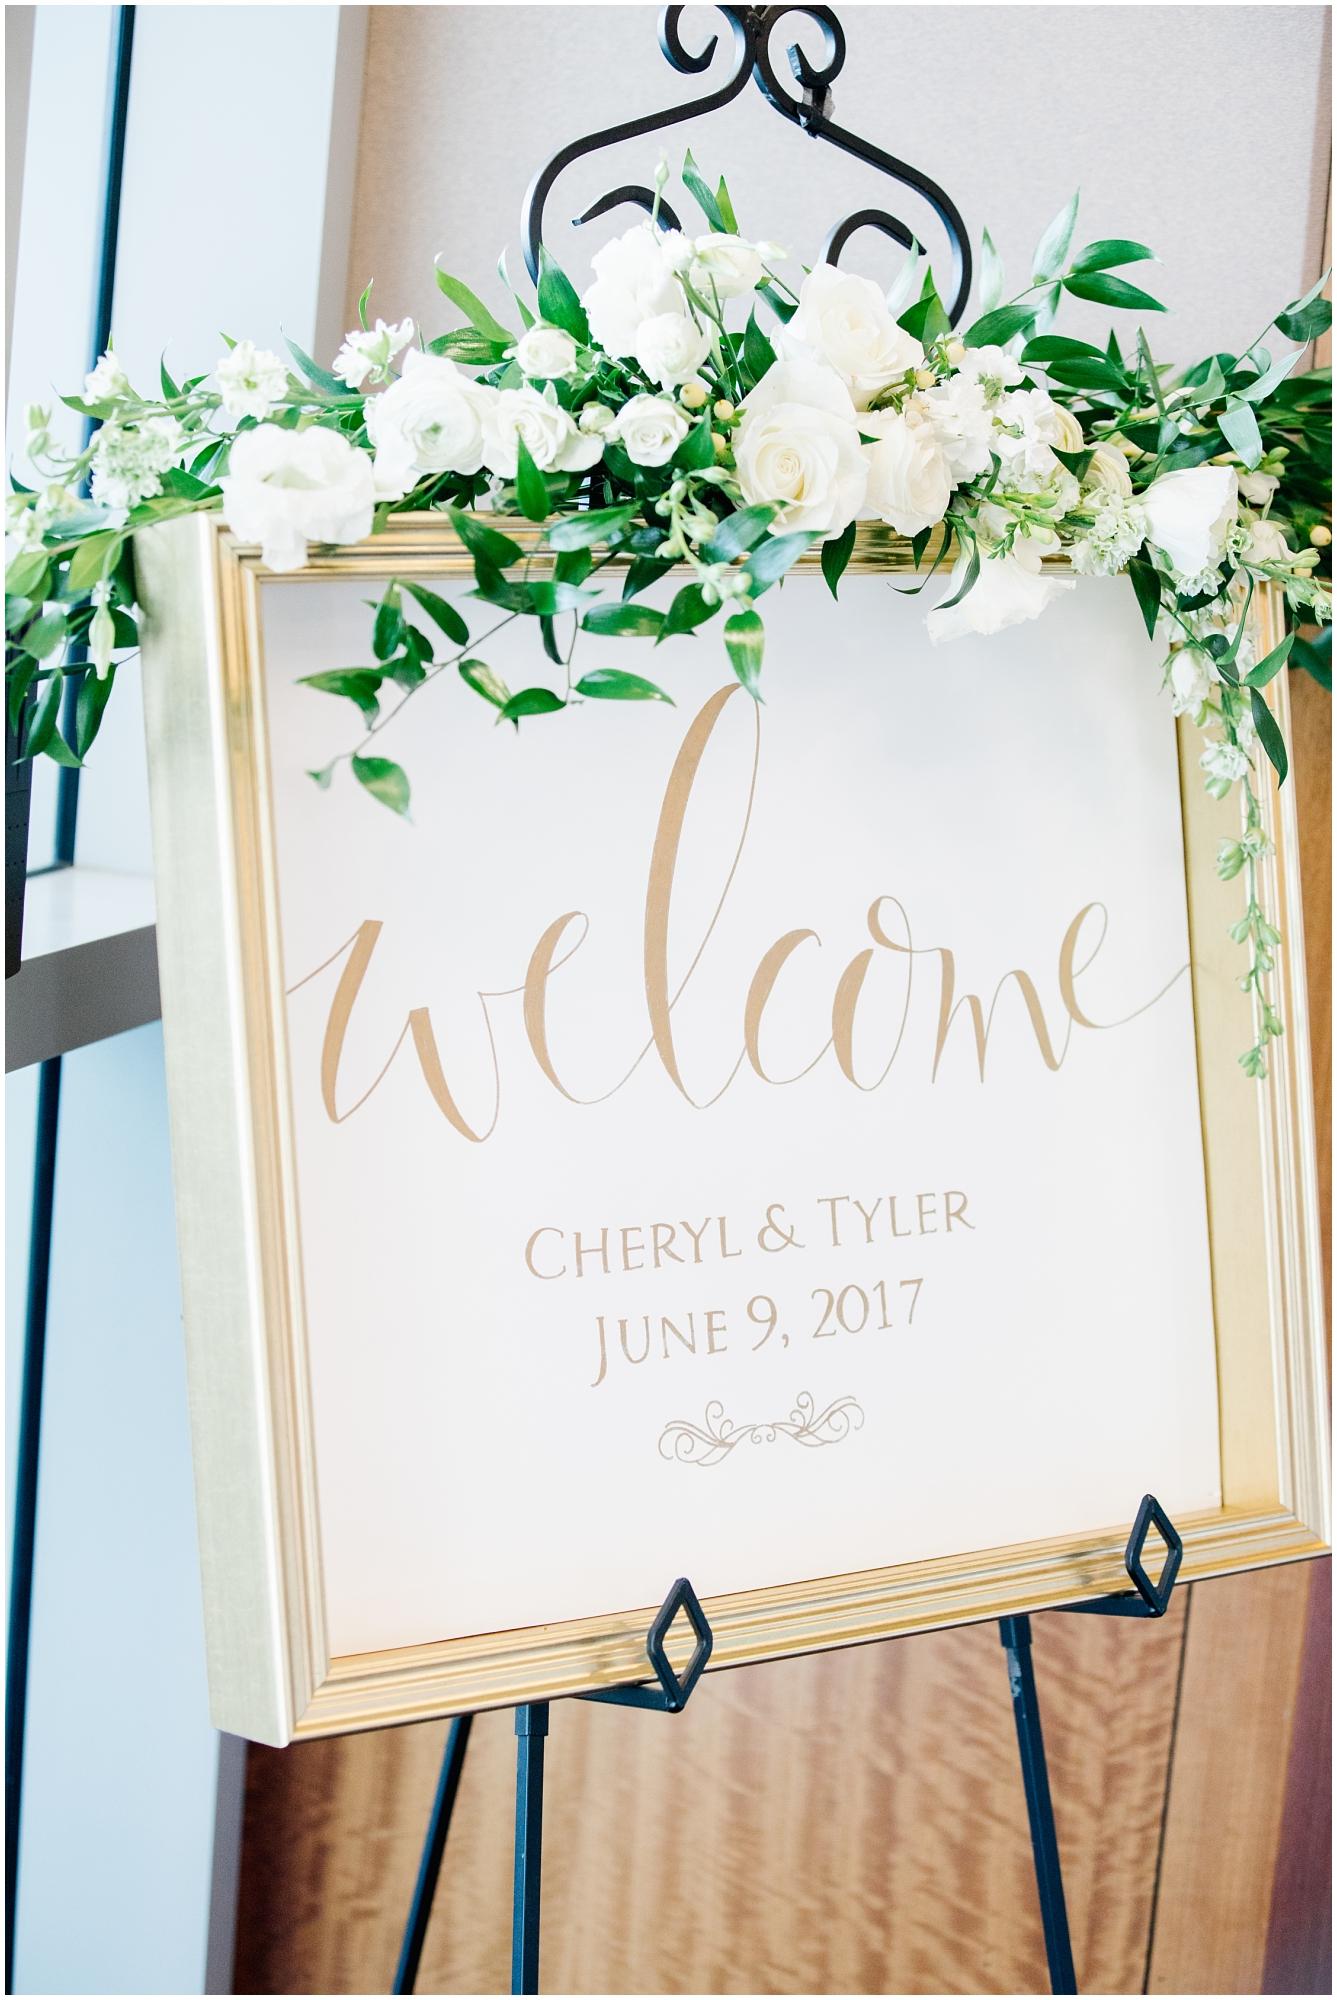 CherylandTyler-503_Lizzie-B-Imagery-Utah-Wedding-Photographer-Park-City-Salt-Lake-City-Temple-Wells-Fargo-Building.jpg